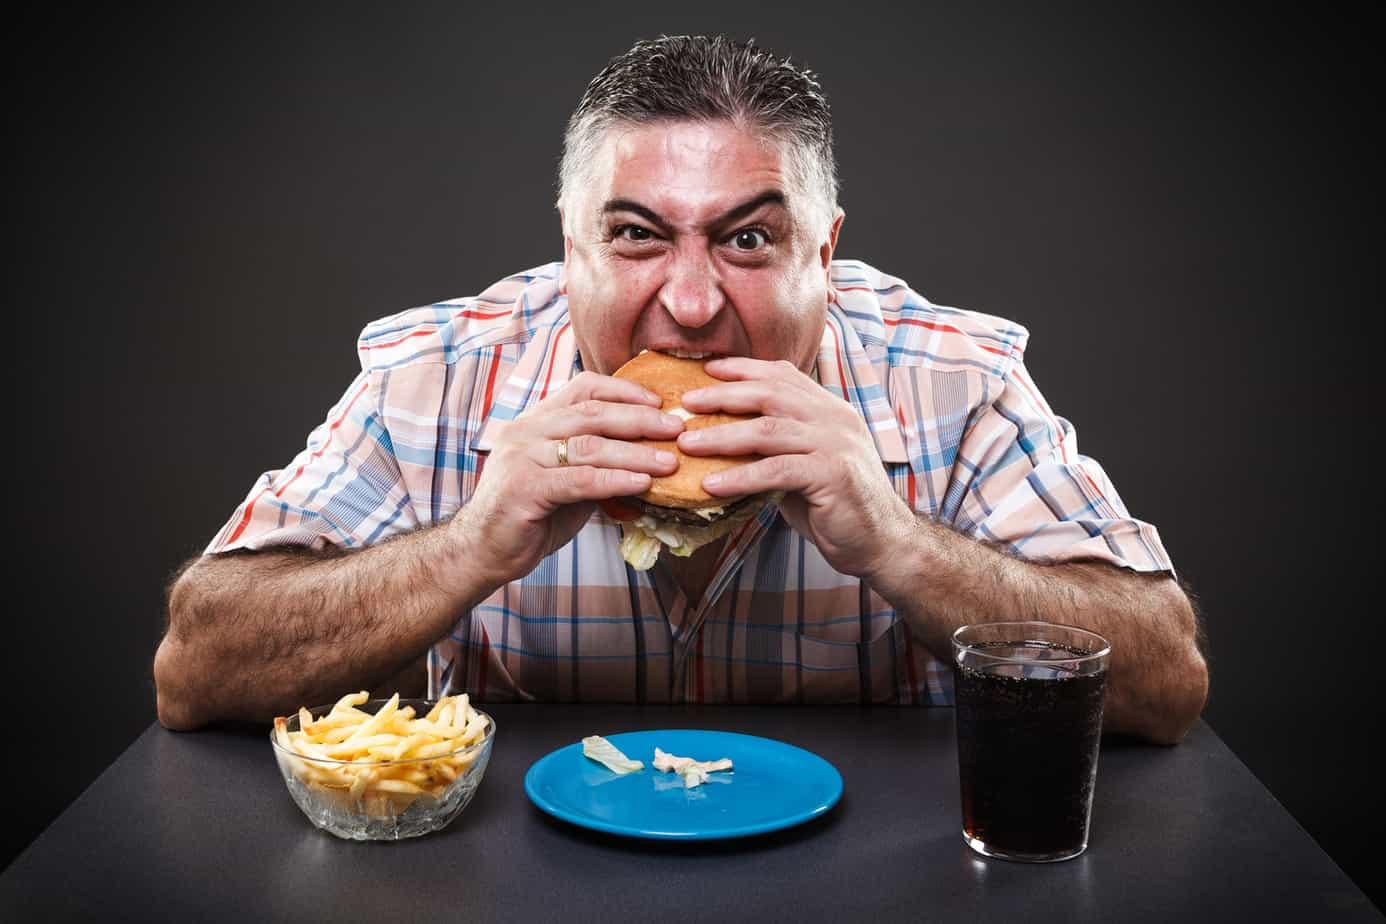 Greedy man eating burger